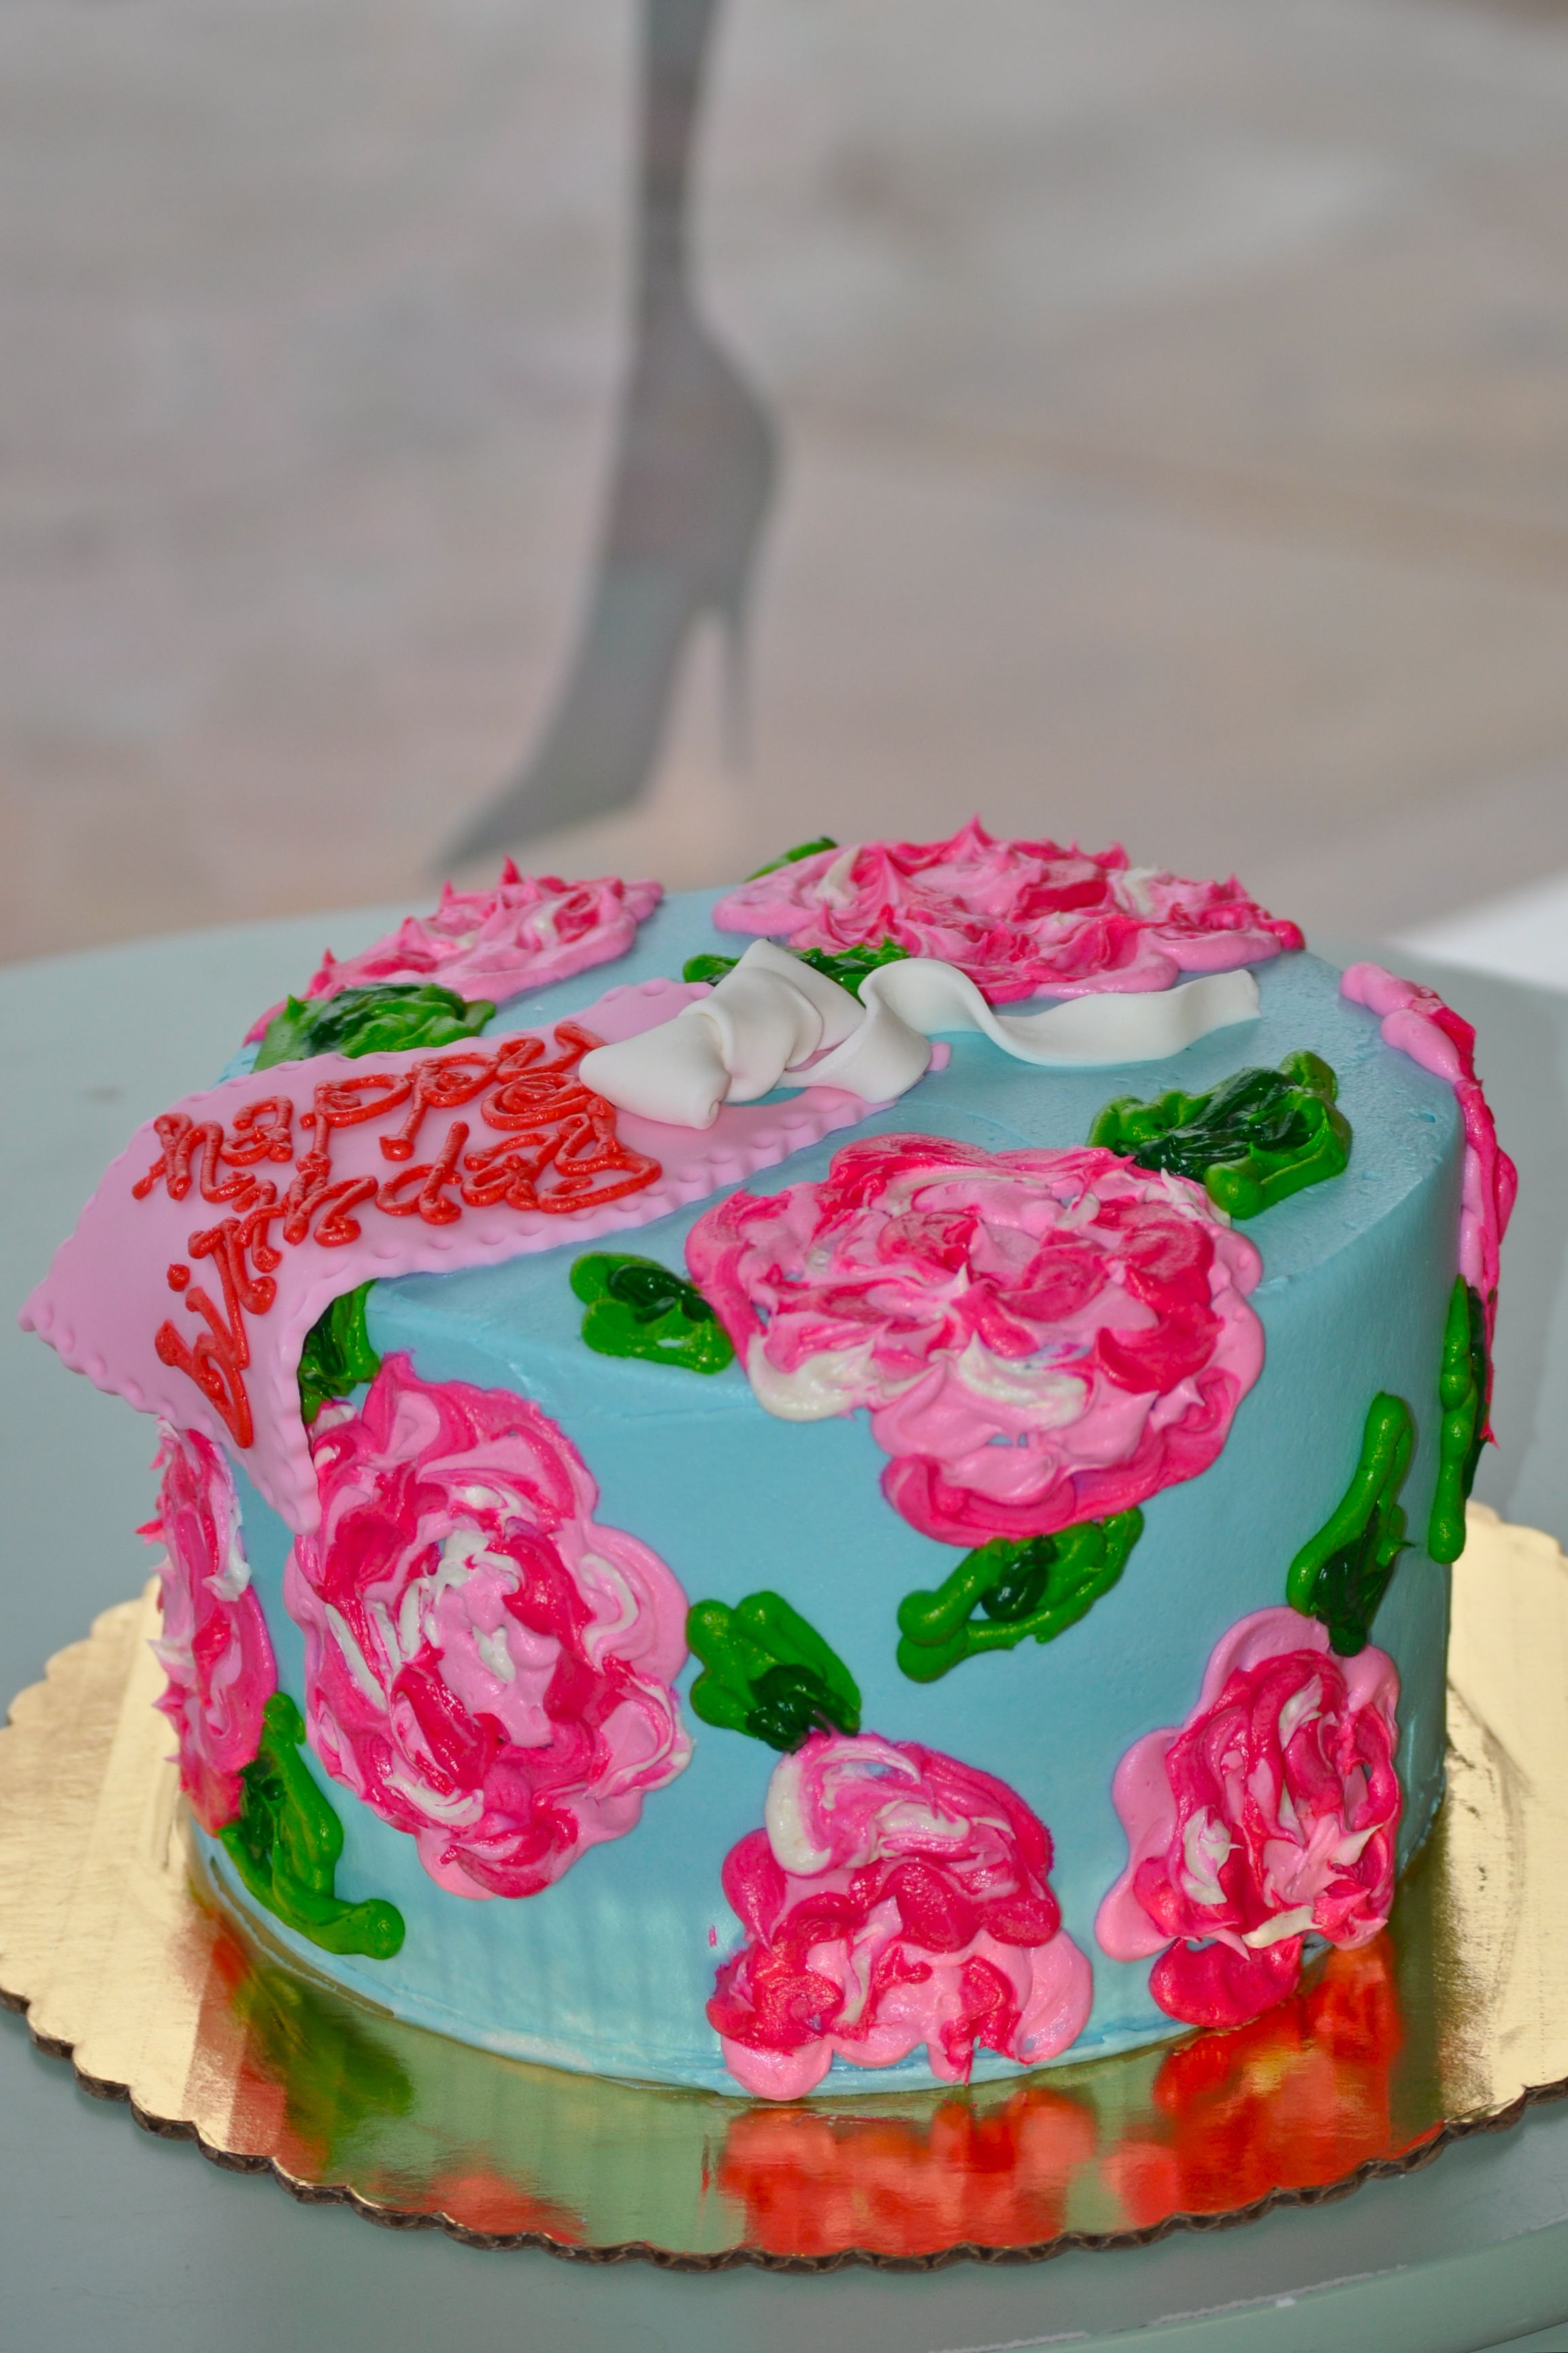 Lilly Pulitzer Birthday Cake wwwleahssweettreatscom Custom